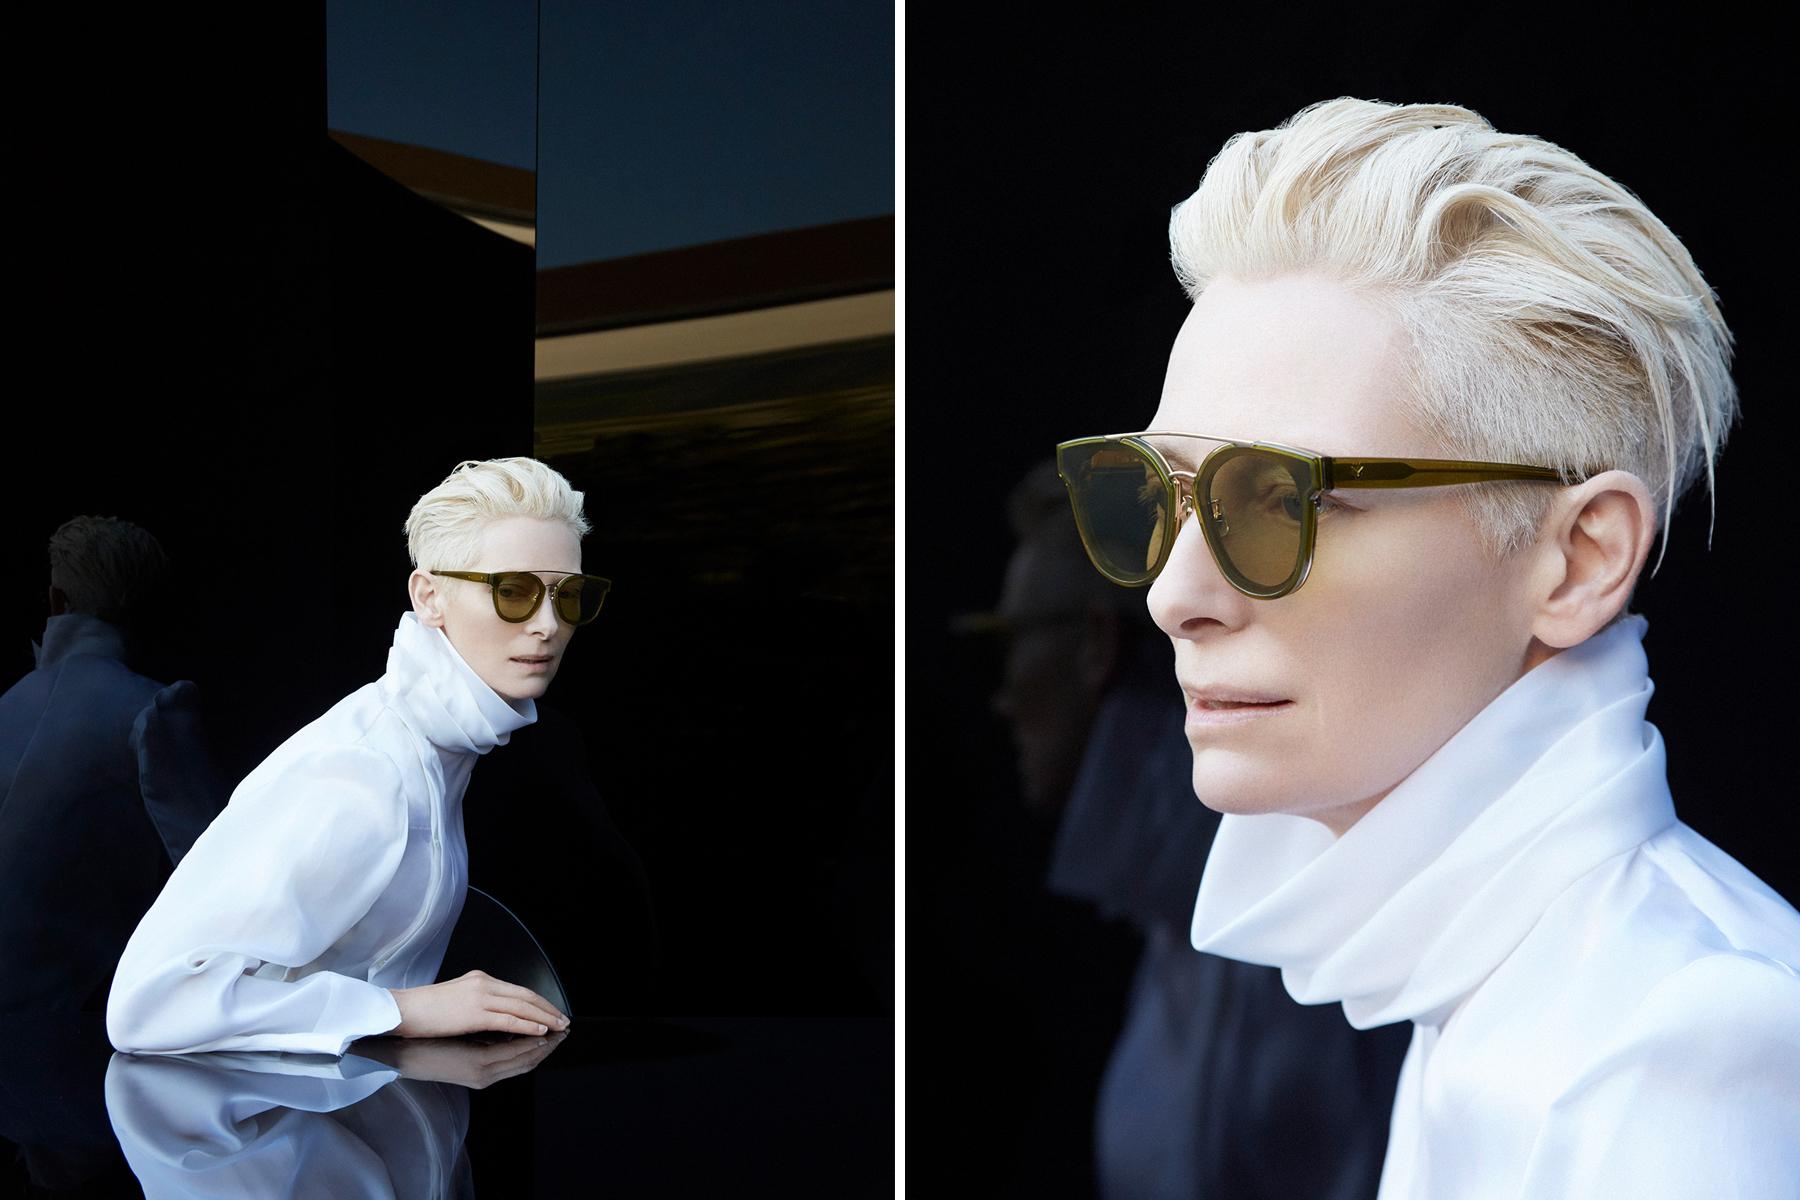 Tilda Swinton Gentle Monster Eyewear Collaboration